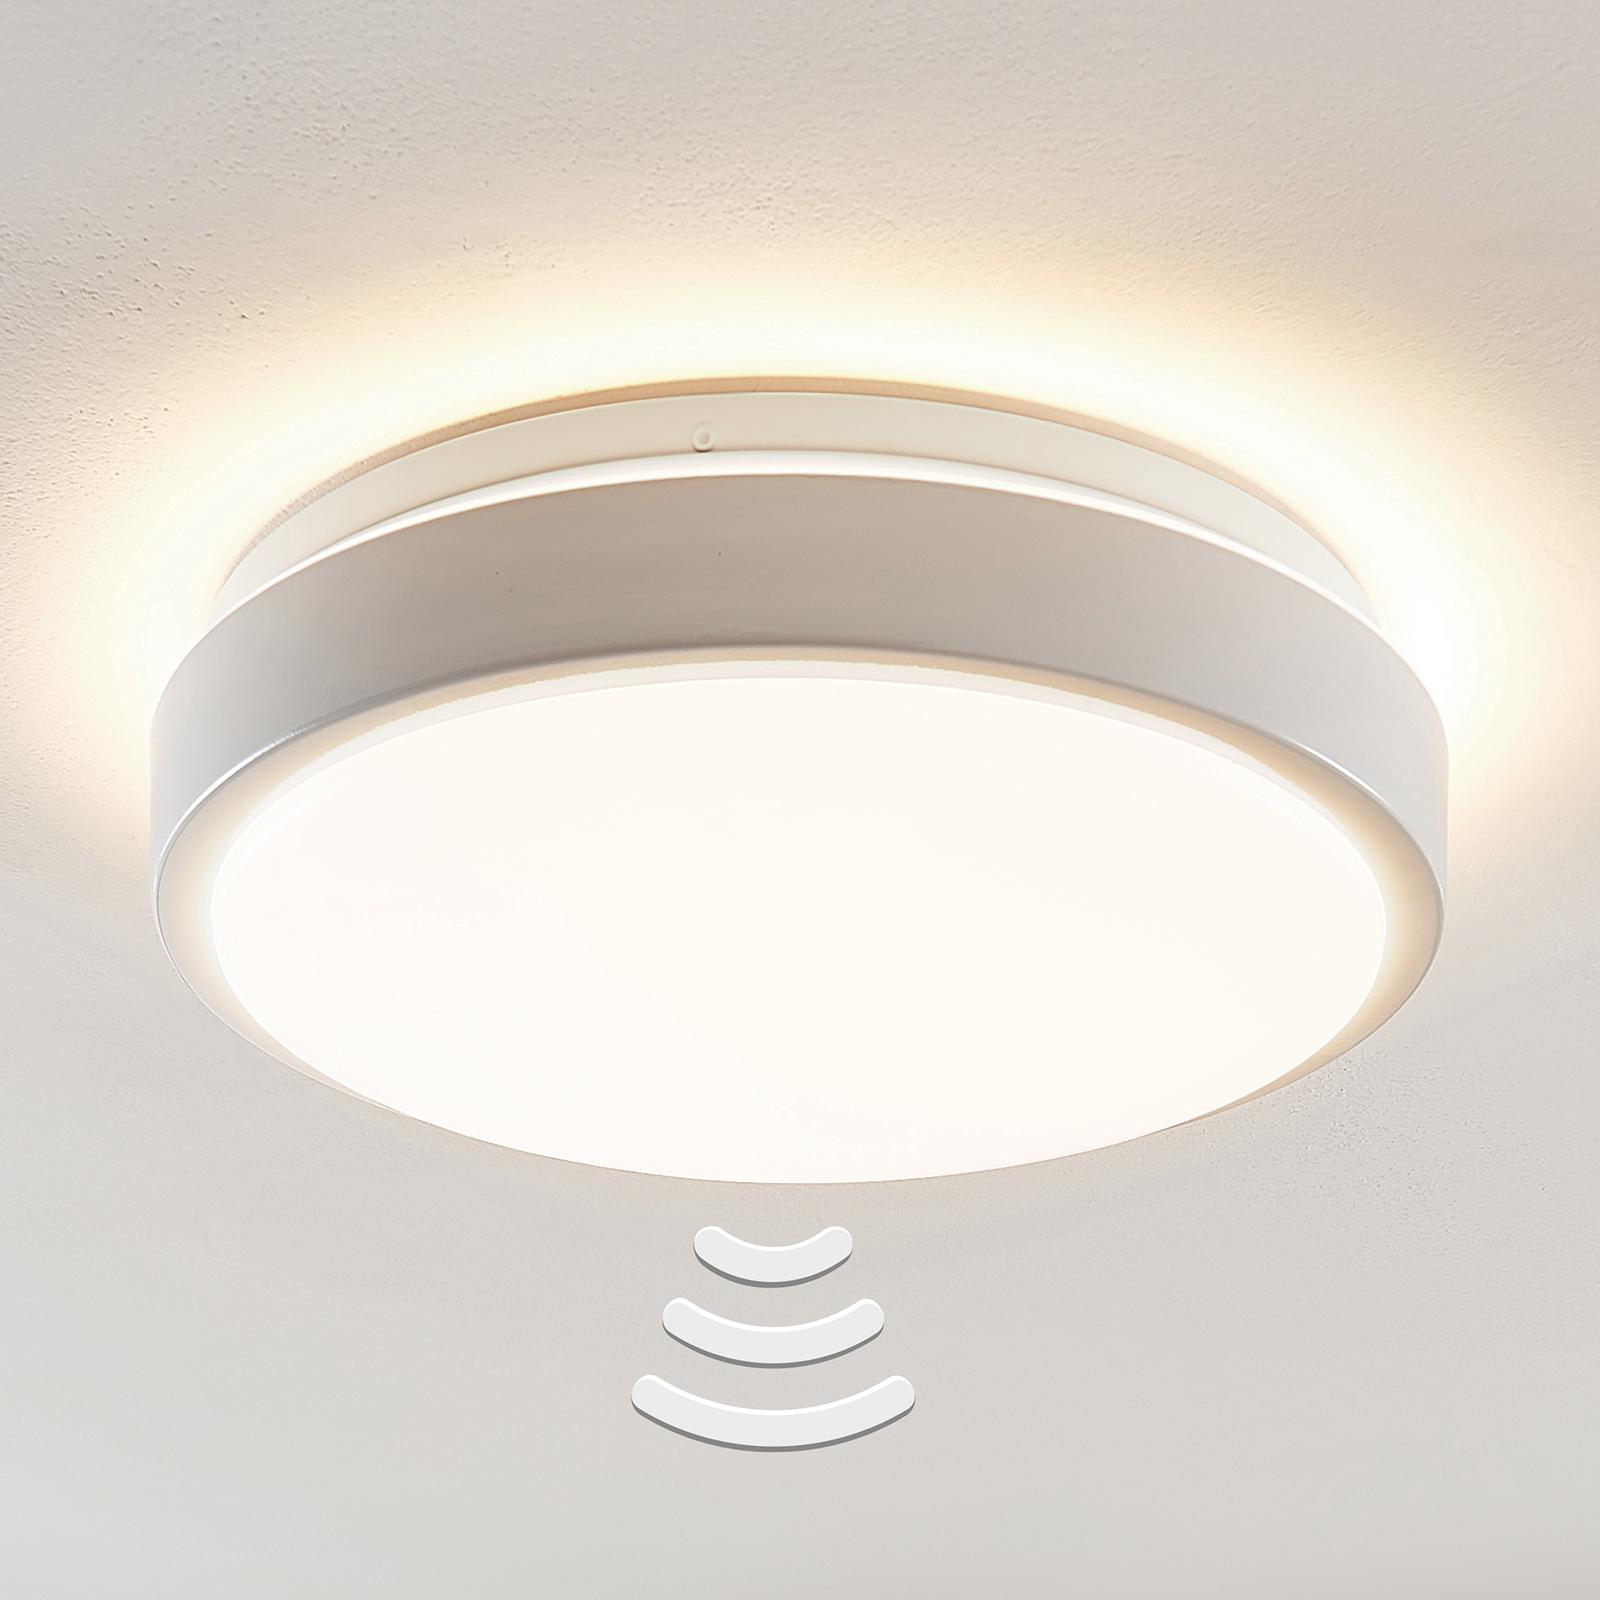 Lindby Camille lampa sufitowa LED Ø33cm biała